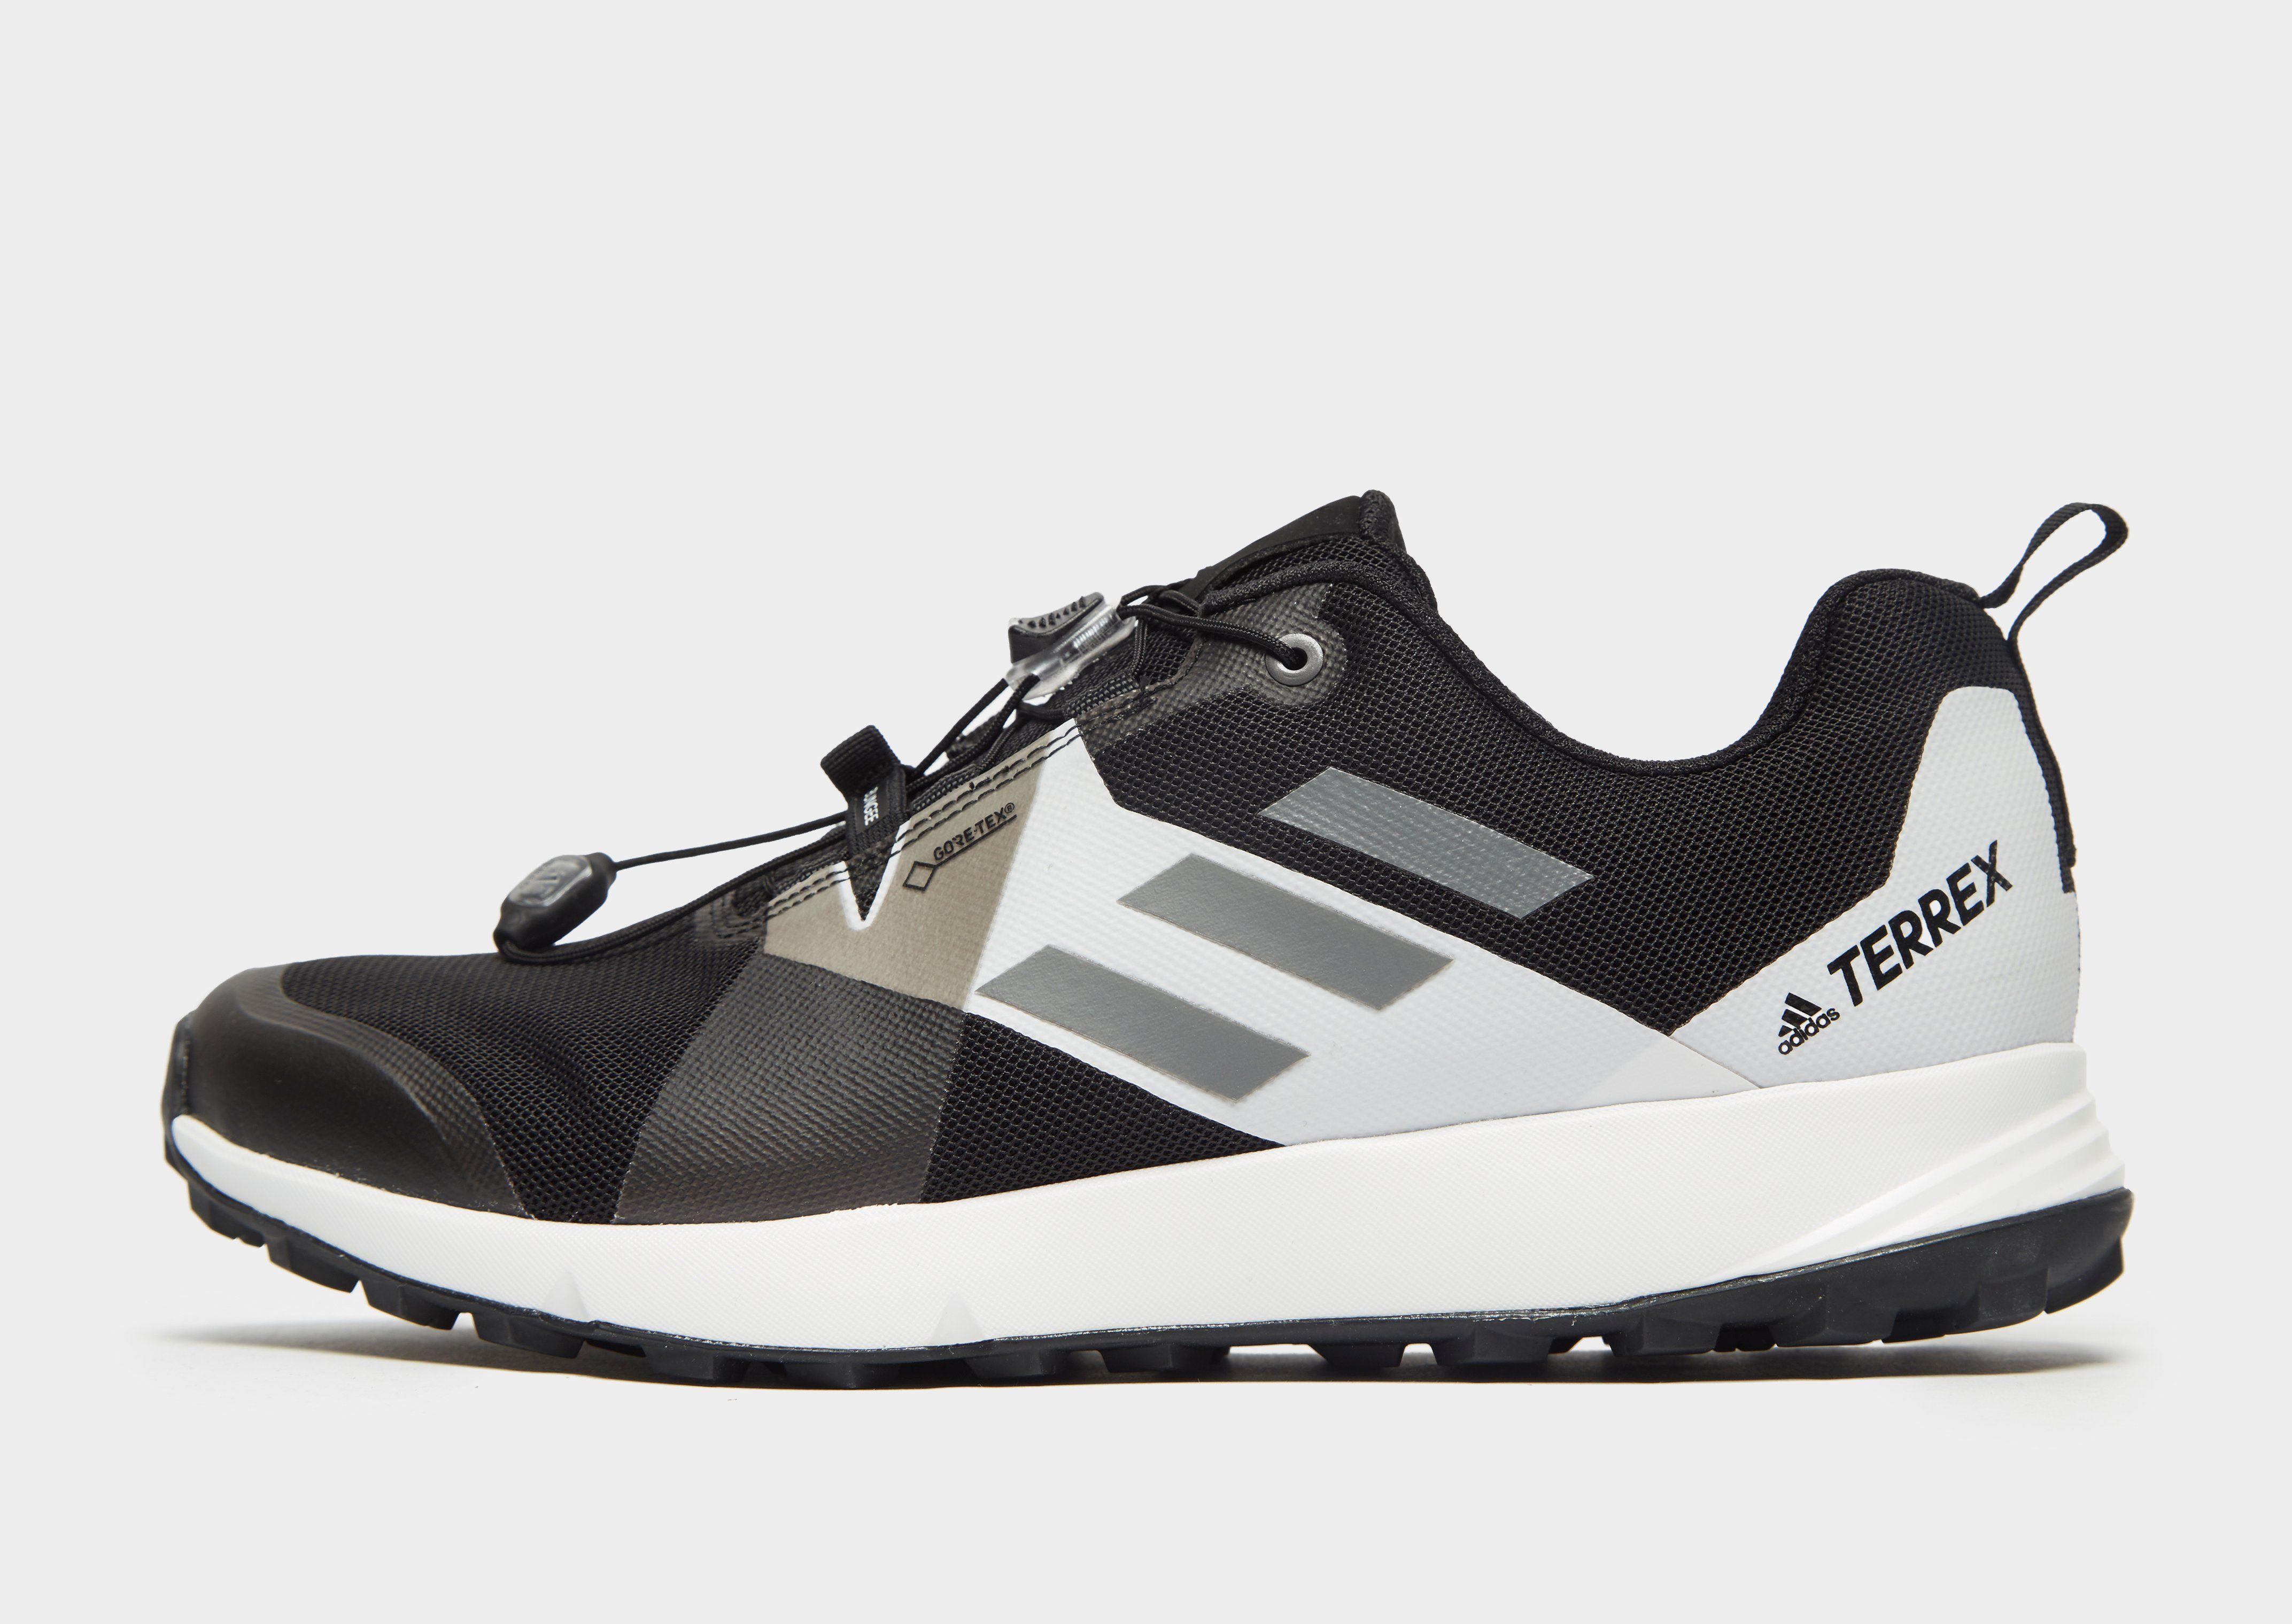 ADIDAS Terrex Two GTX Shoes